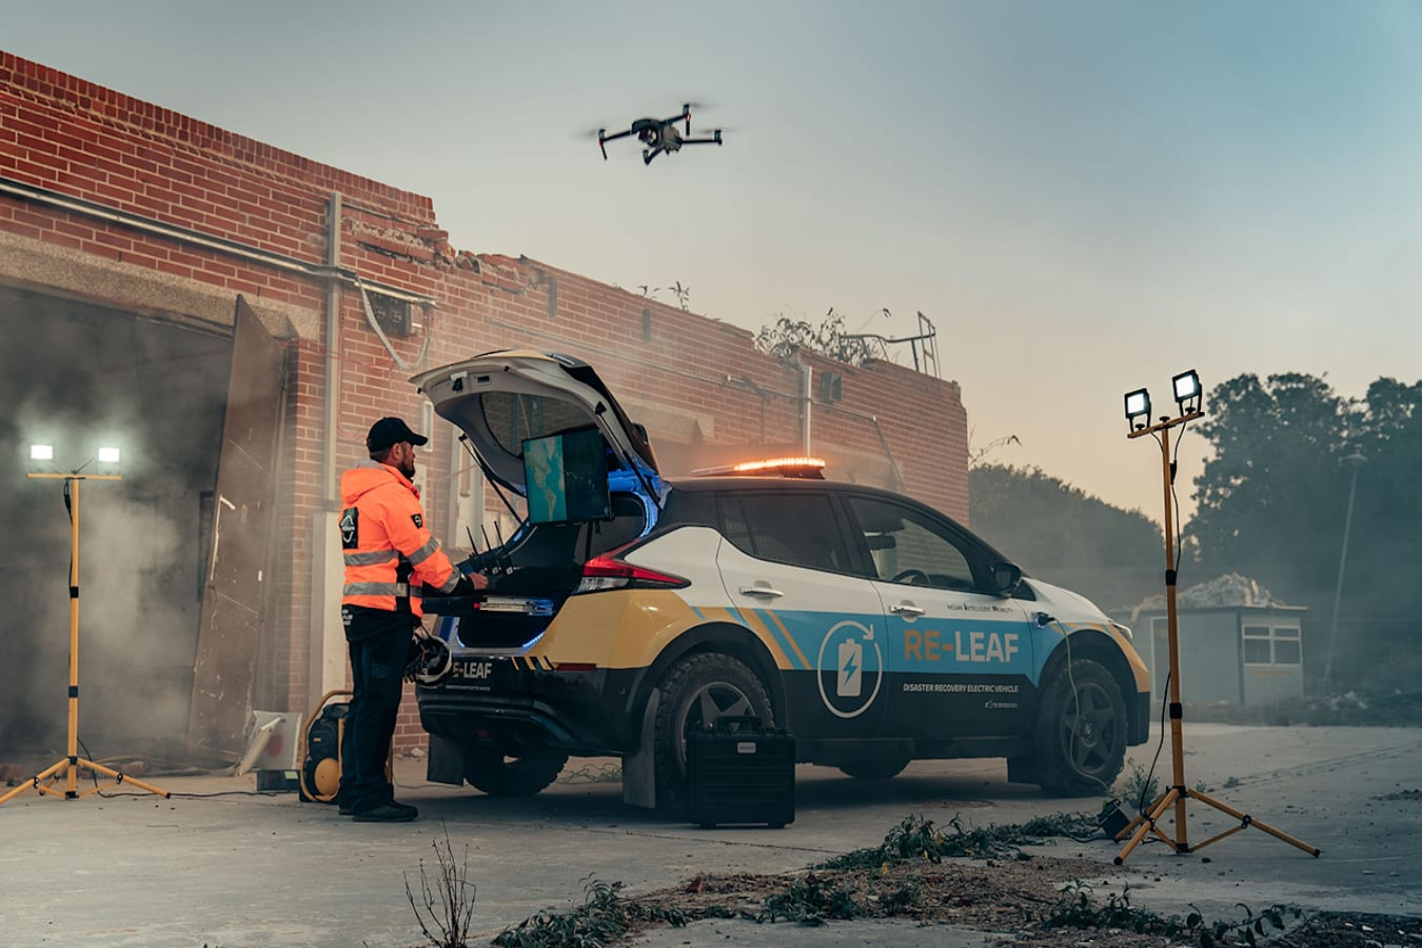 Nissan RE-LEAF DRONE